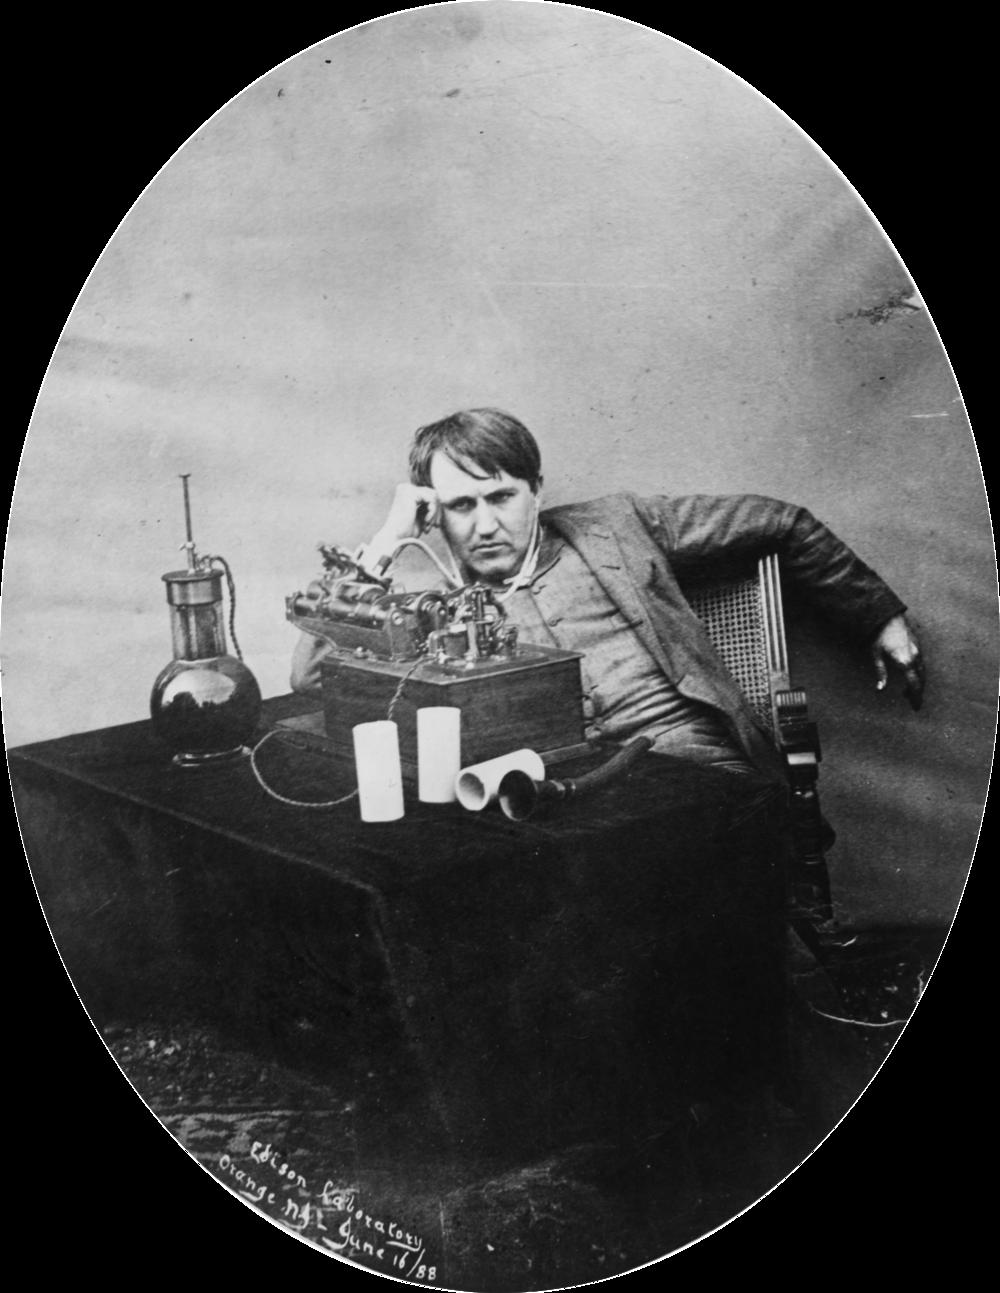 Thomas Edison listening to wax cylindrical units (1888). Wikimedia Commons (public domain)